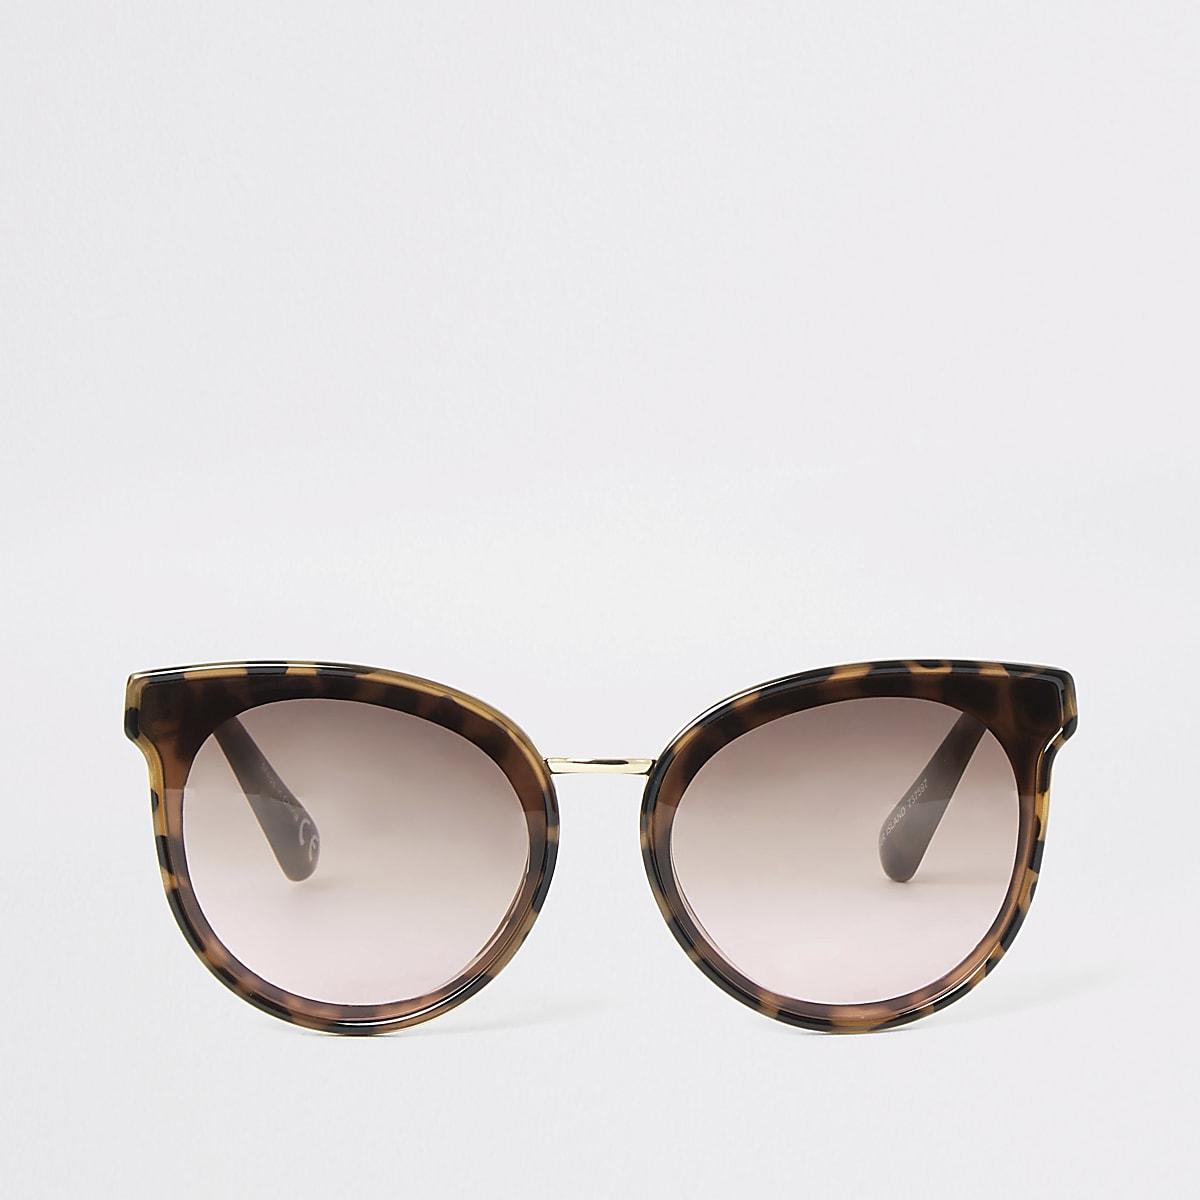 Brown tortoise shell round glam sunglasses